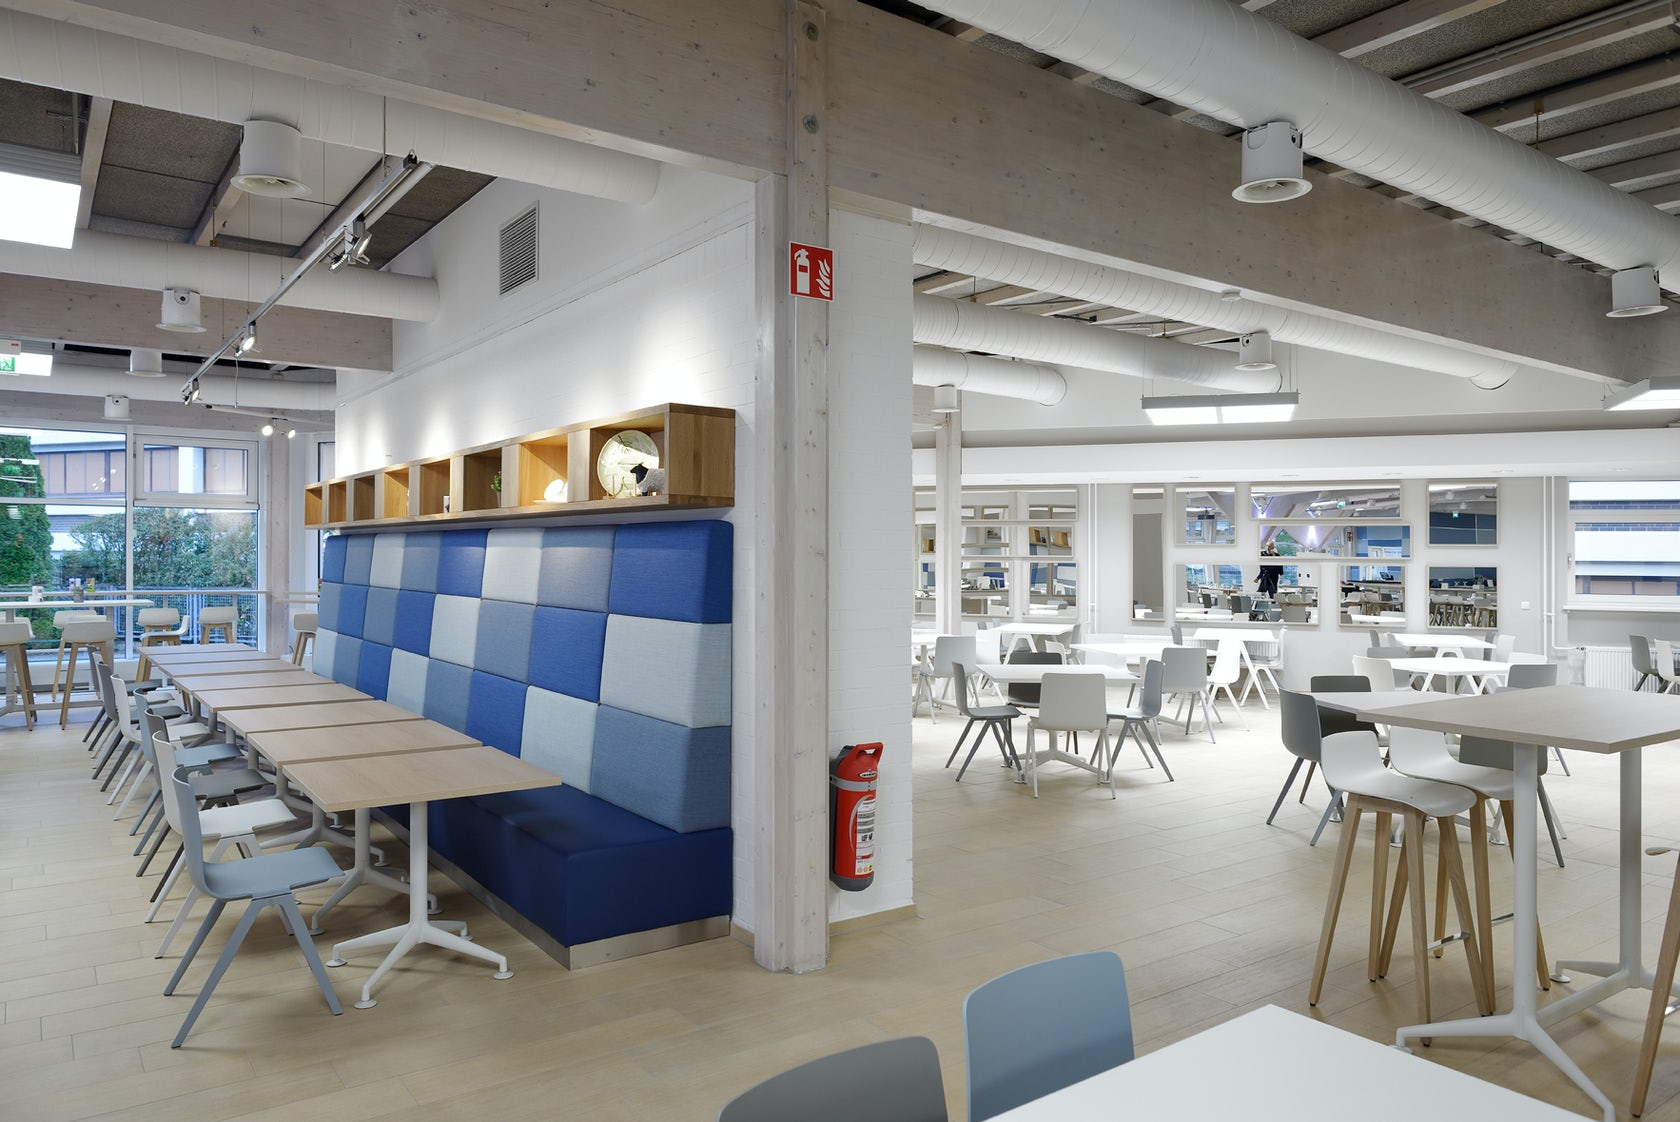 philips dmc cafeteria architizer. Black Bedroom Furniture Sets. Home Design Ideas